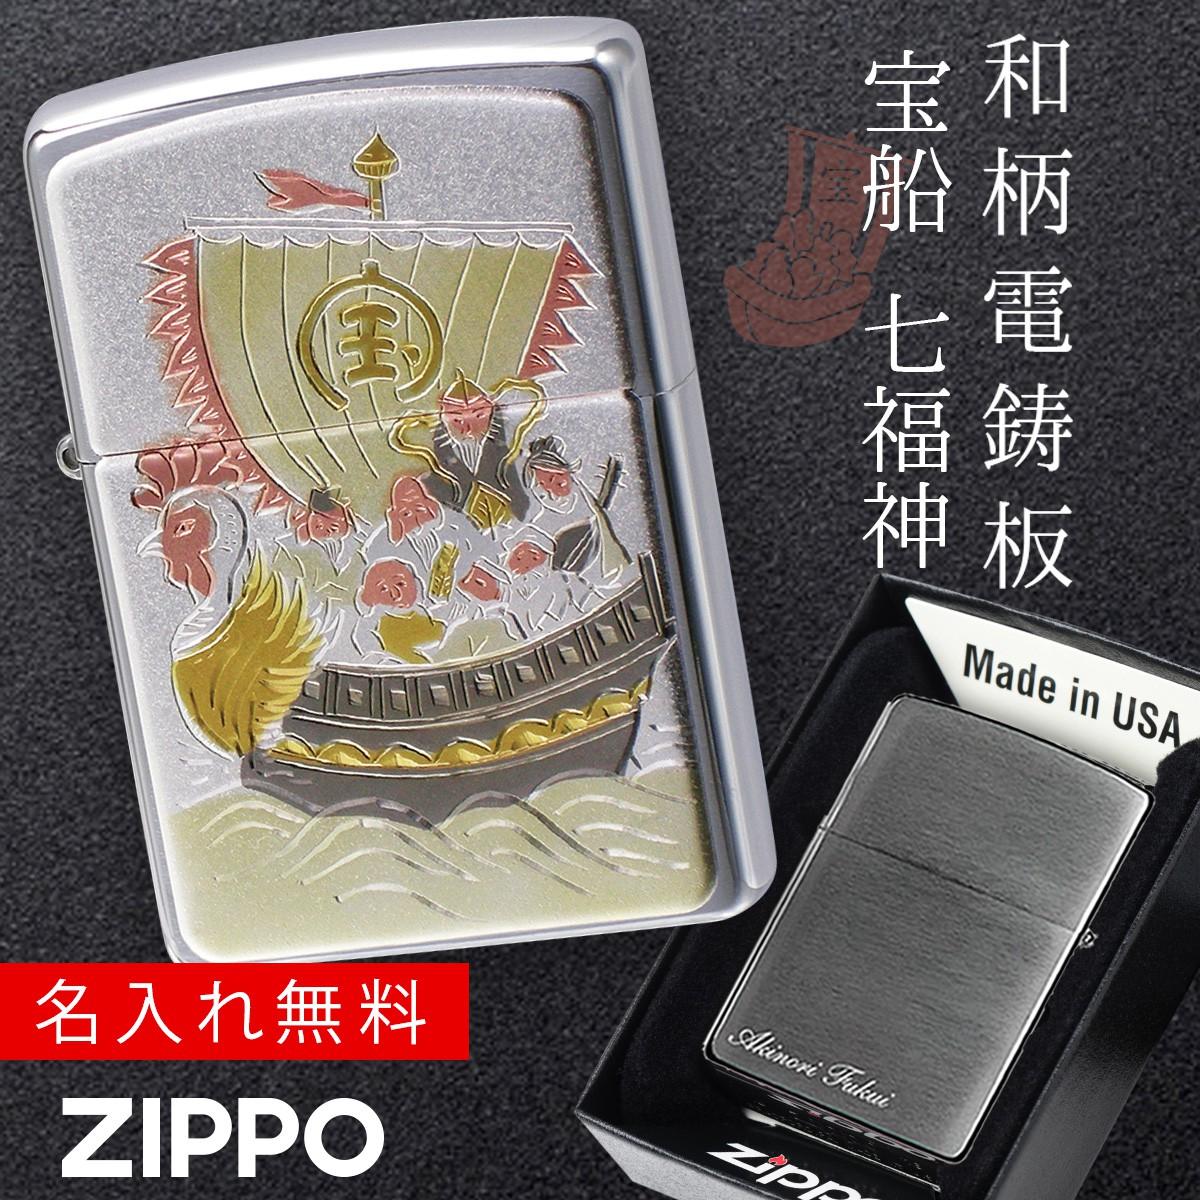 zippo 名入れ ジッポー ライター 和柄 伝統の技術 電鋳板 ZP 宝船 名入れ ギフト ギフト プレゼント 贈り物 返品不可 彫刻 無料 名前 名入れ メッセージ